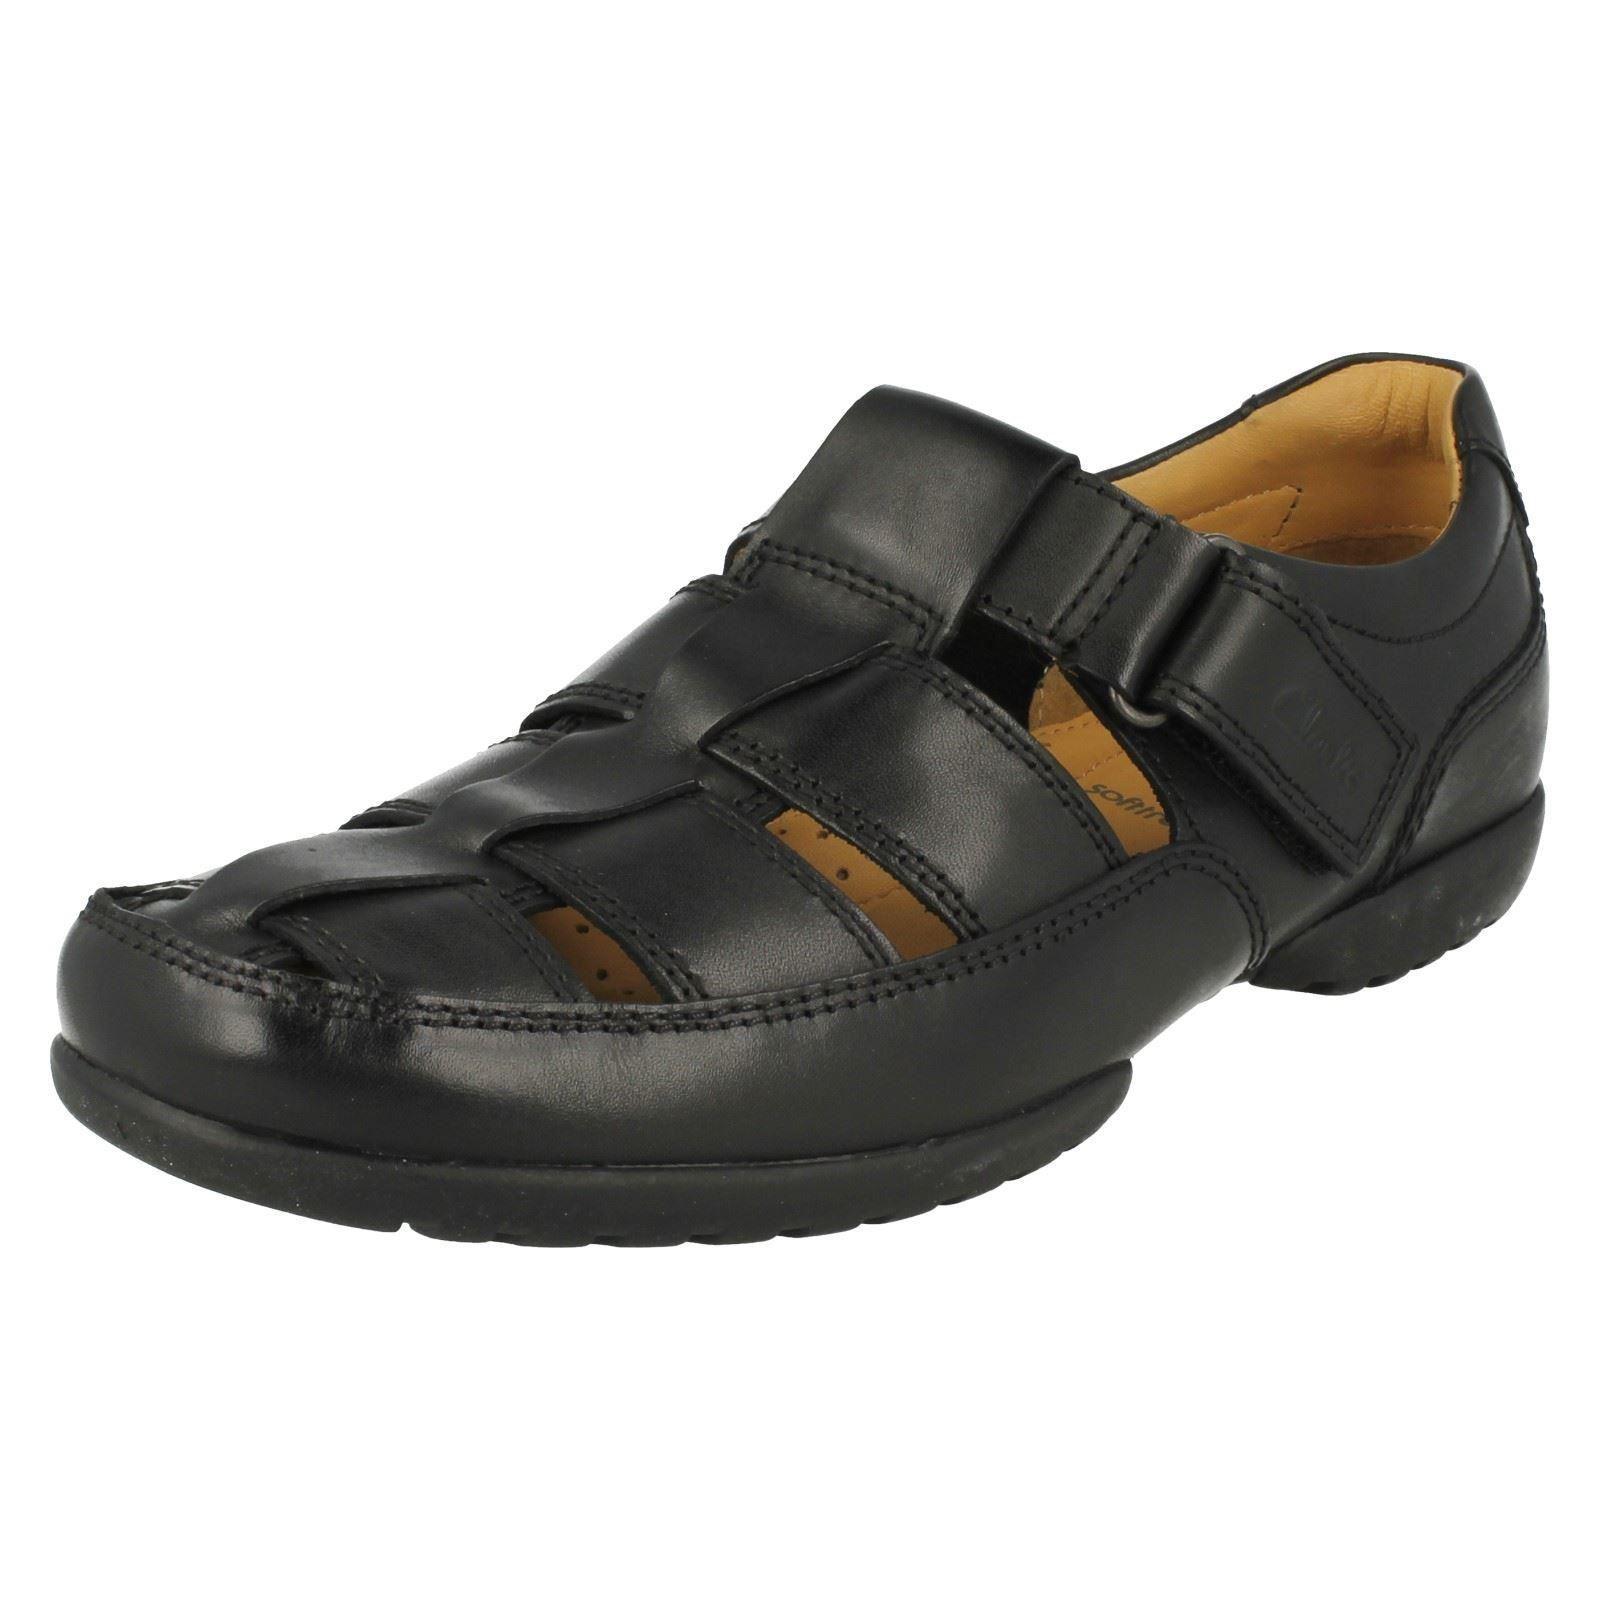 Black sandals debenhams - Picture 2 Of 19